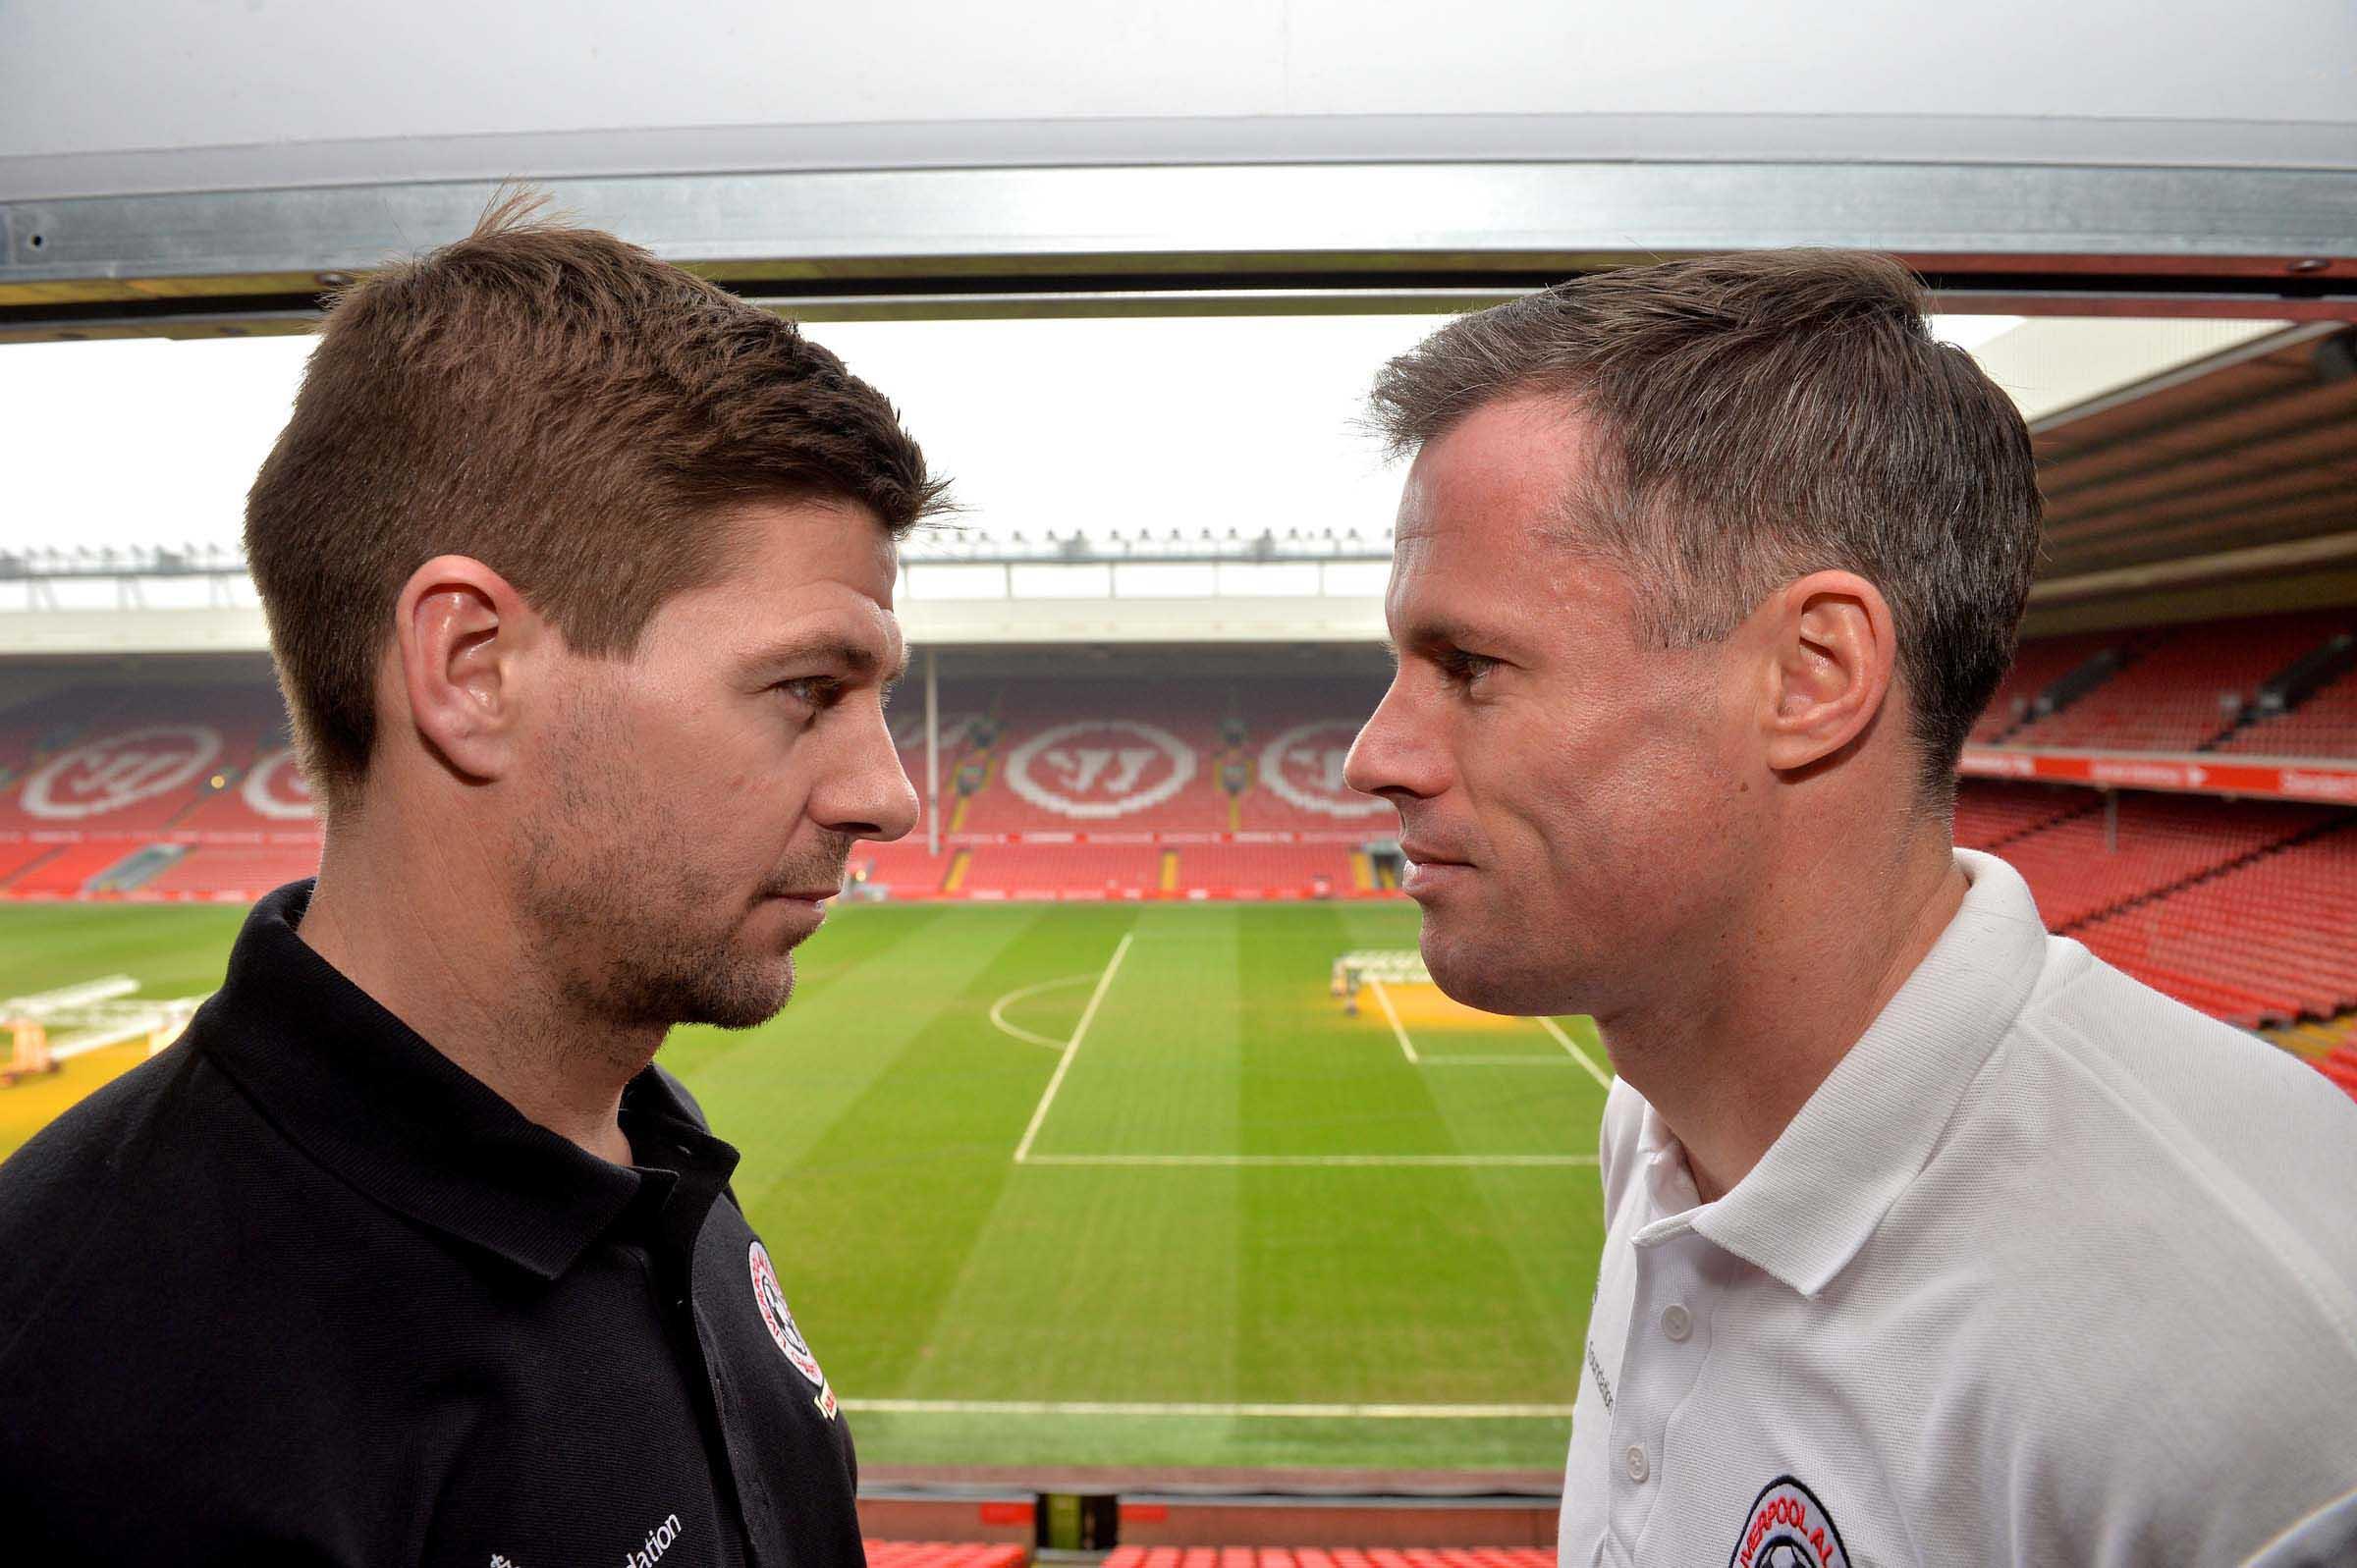 Football - Liverpool FC All-Star Charity Match